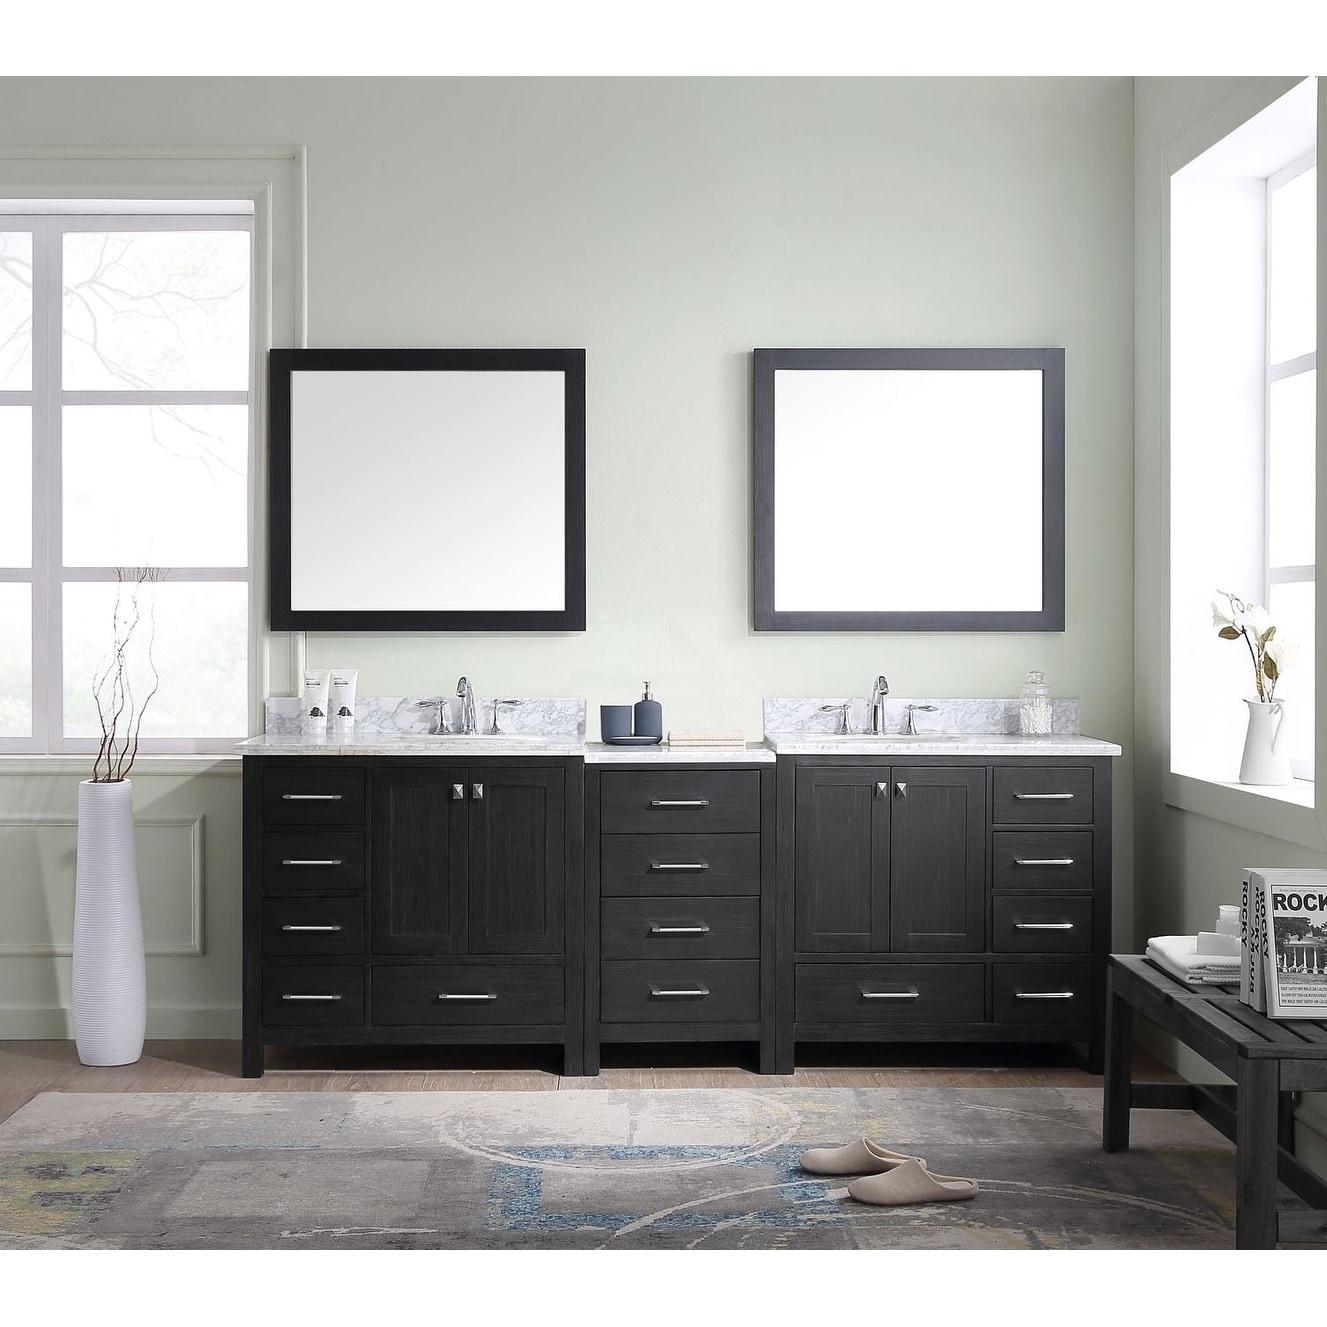 Shop Virtu USA Caroline Premium 90-inch Double Bathroom Vanity Set ...